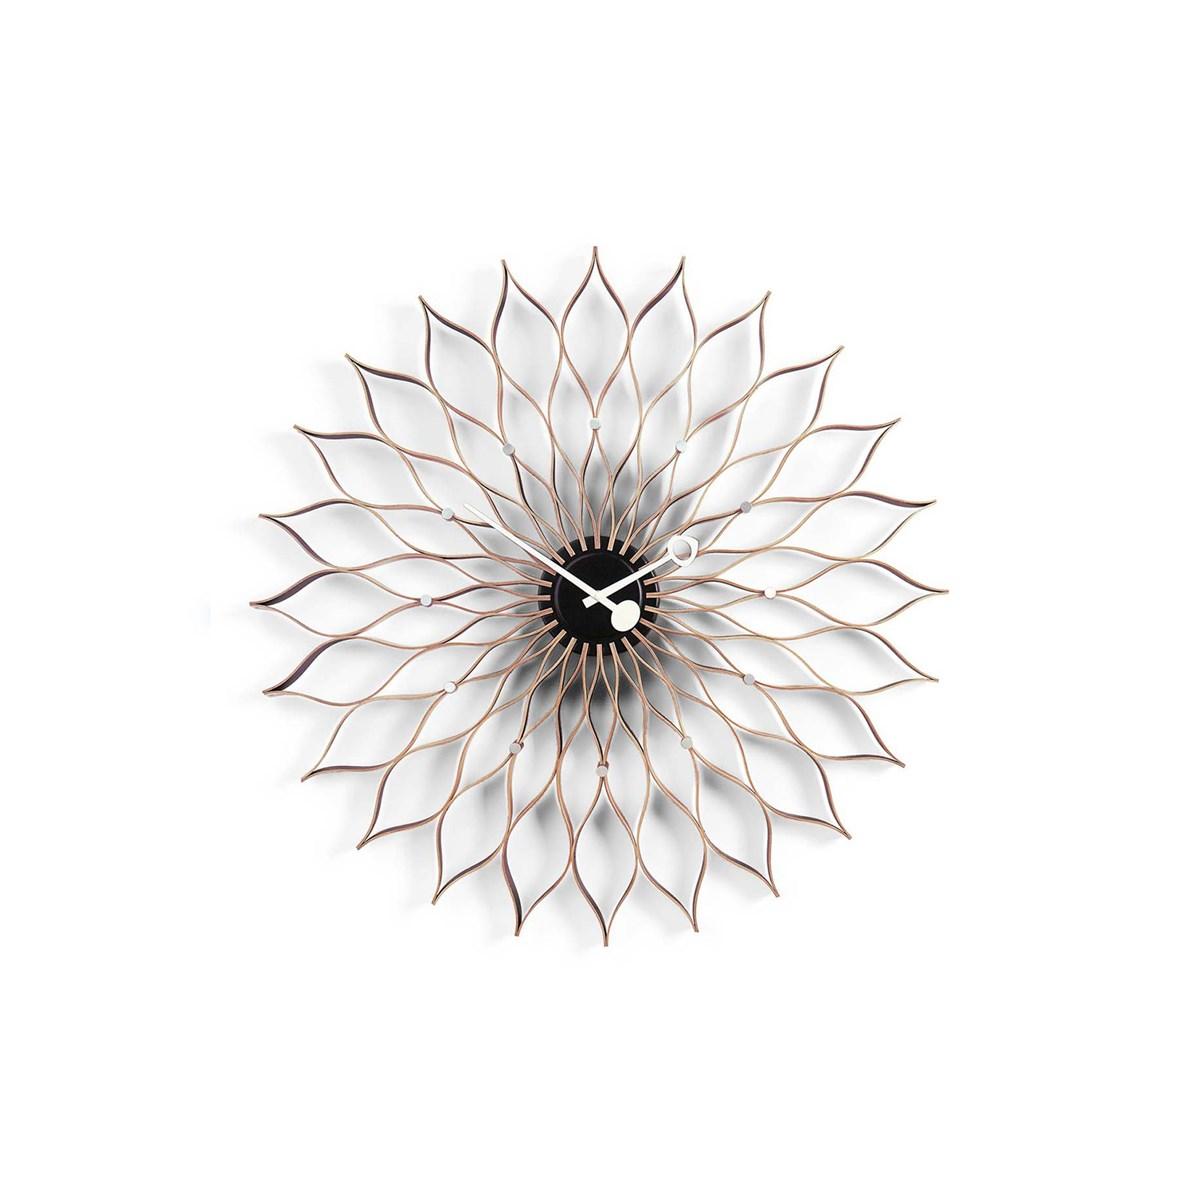 Vitra-George-Nelson-Sunflower-Wall-Clock-Matisse-1